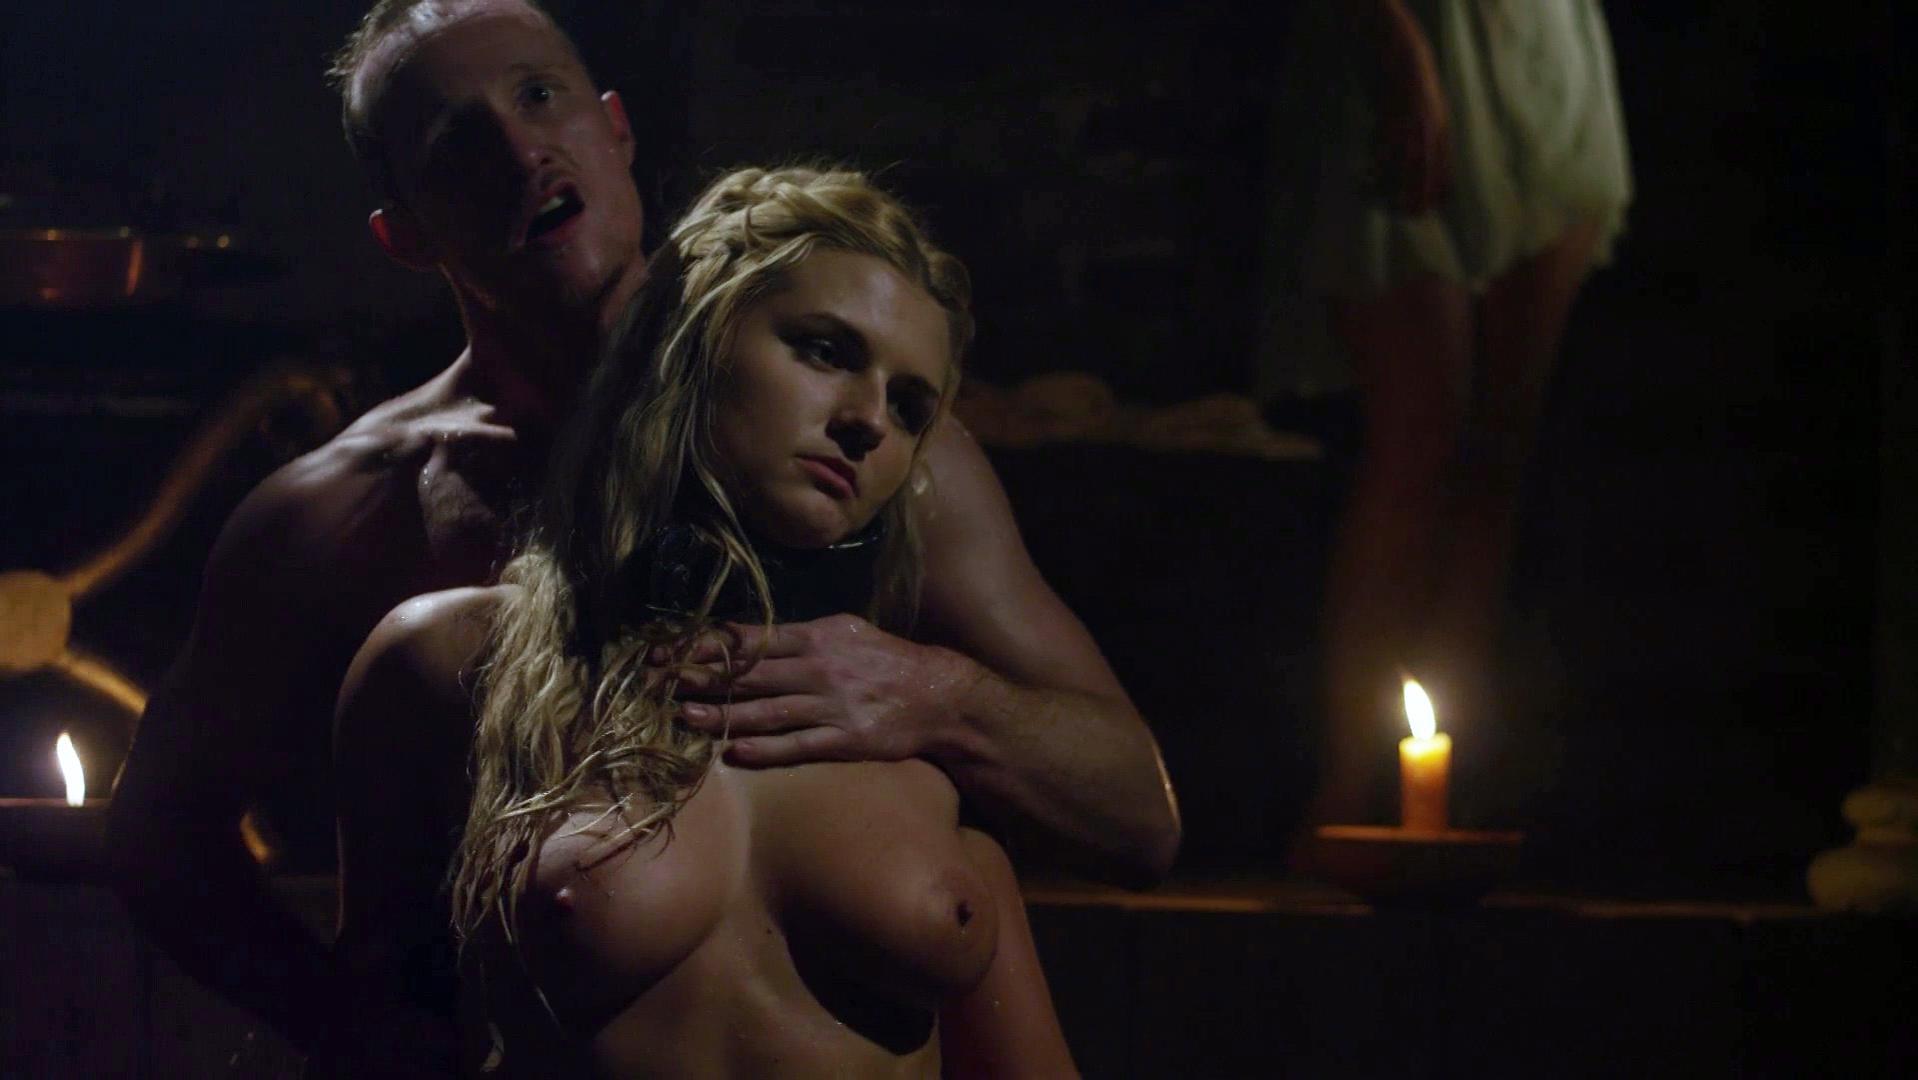 Nude flashing movie and